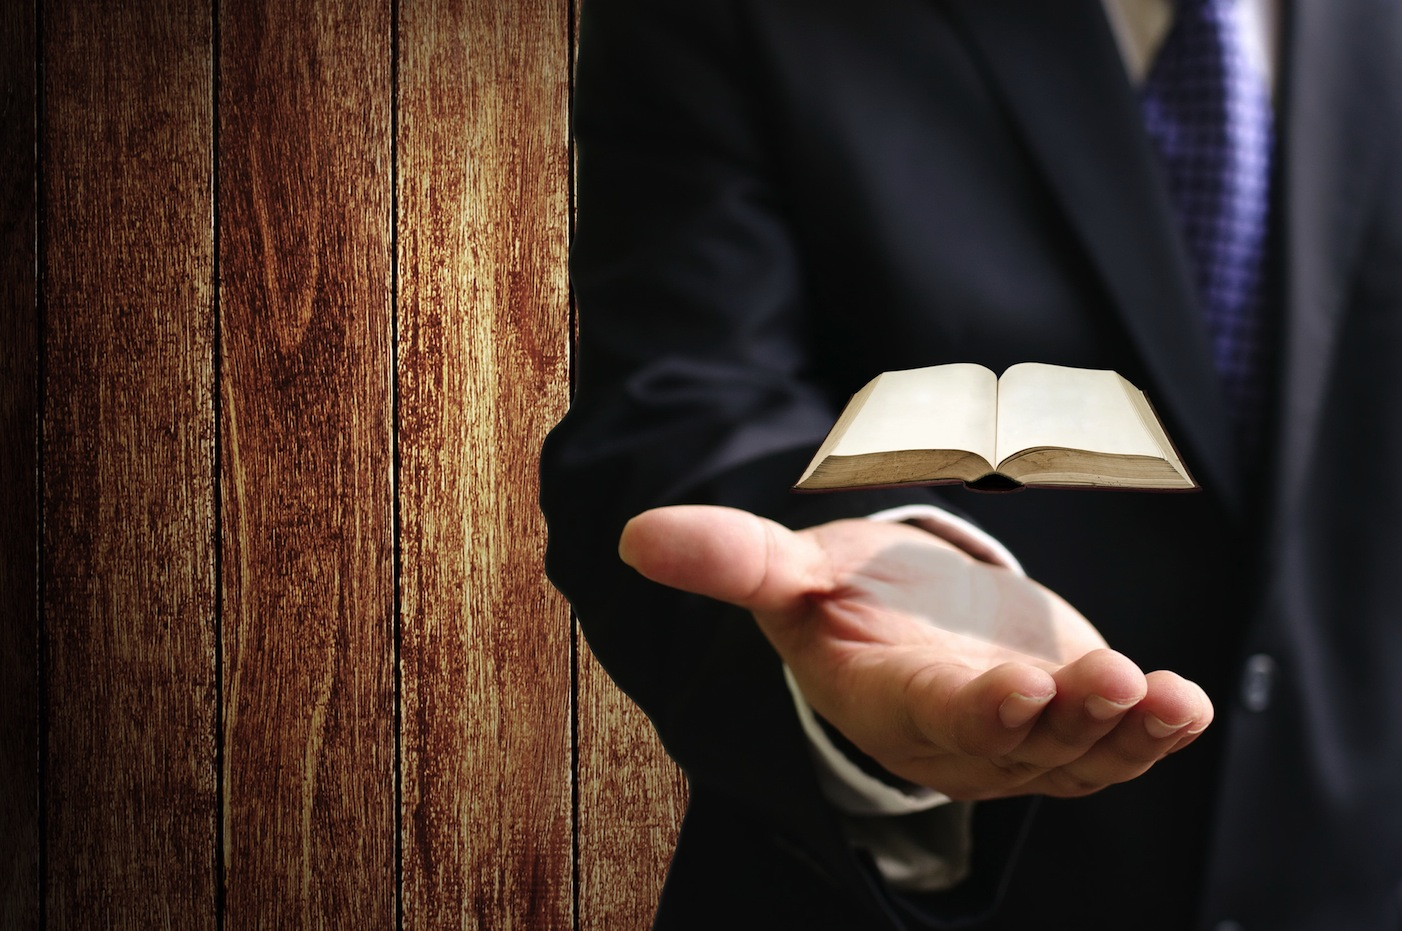 עורך דין נותן מידע שימושי